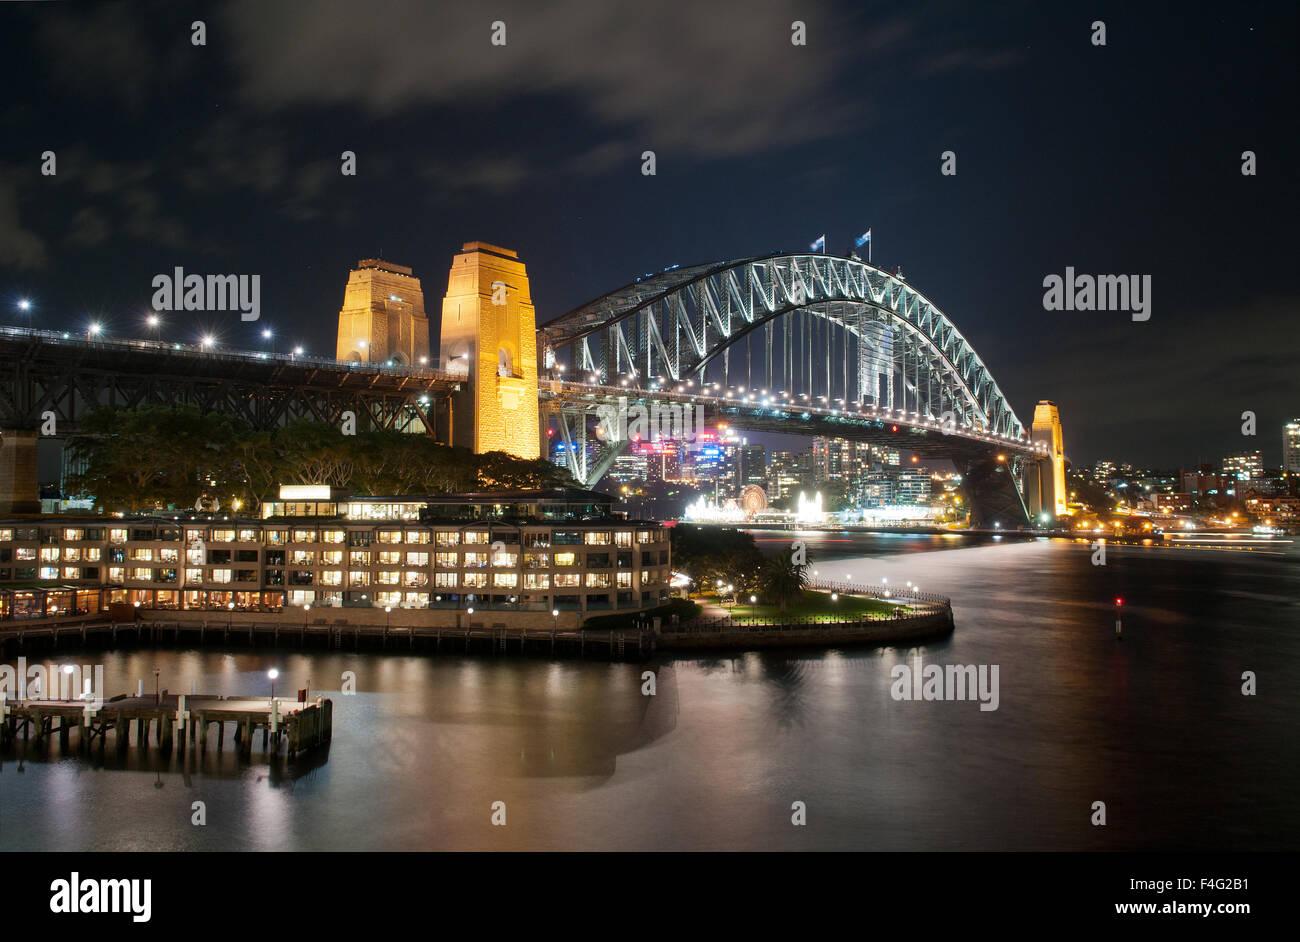 Sydney Harbour Bridge at night - Stock Image